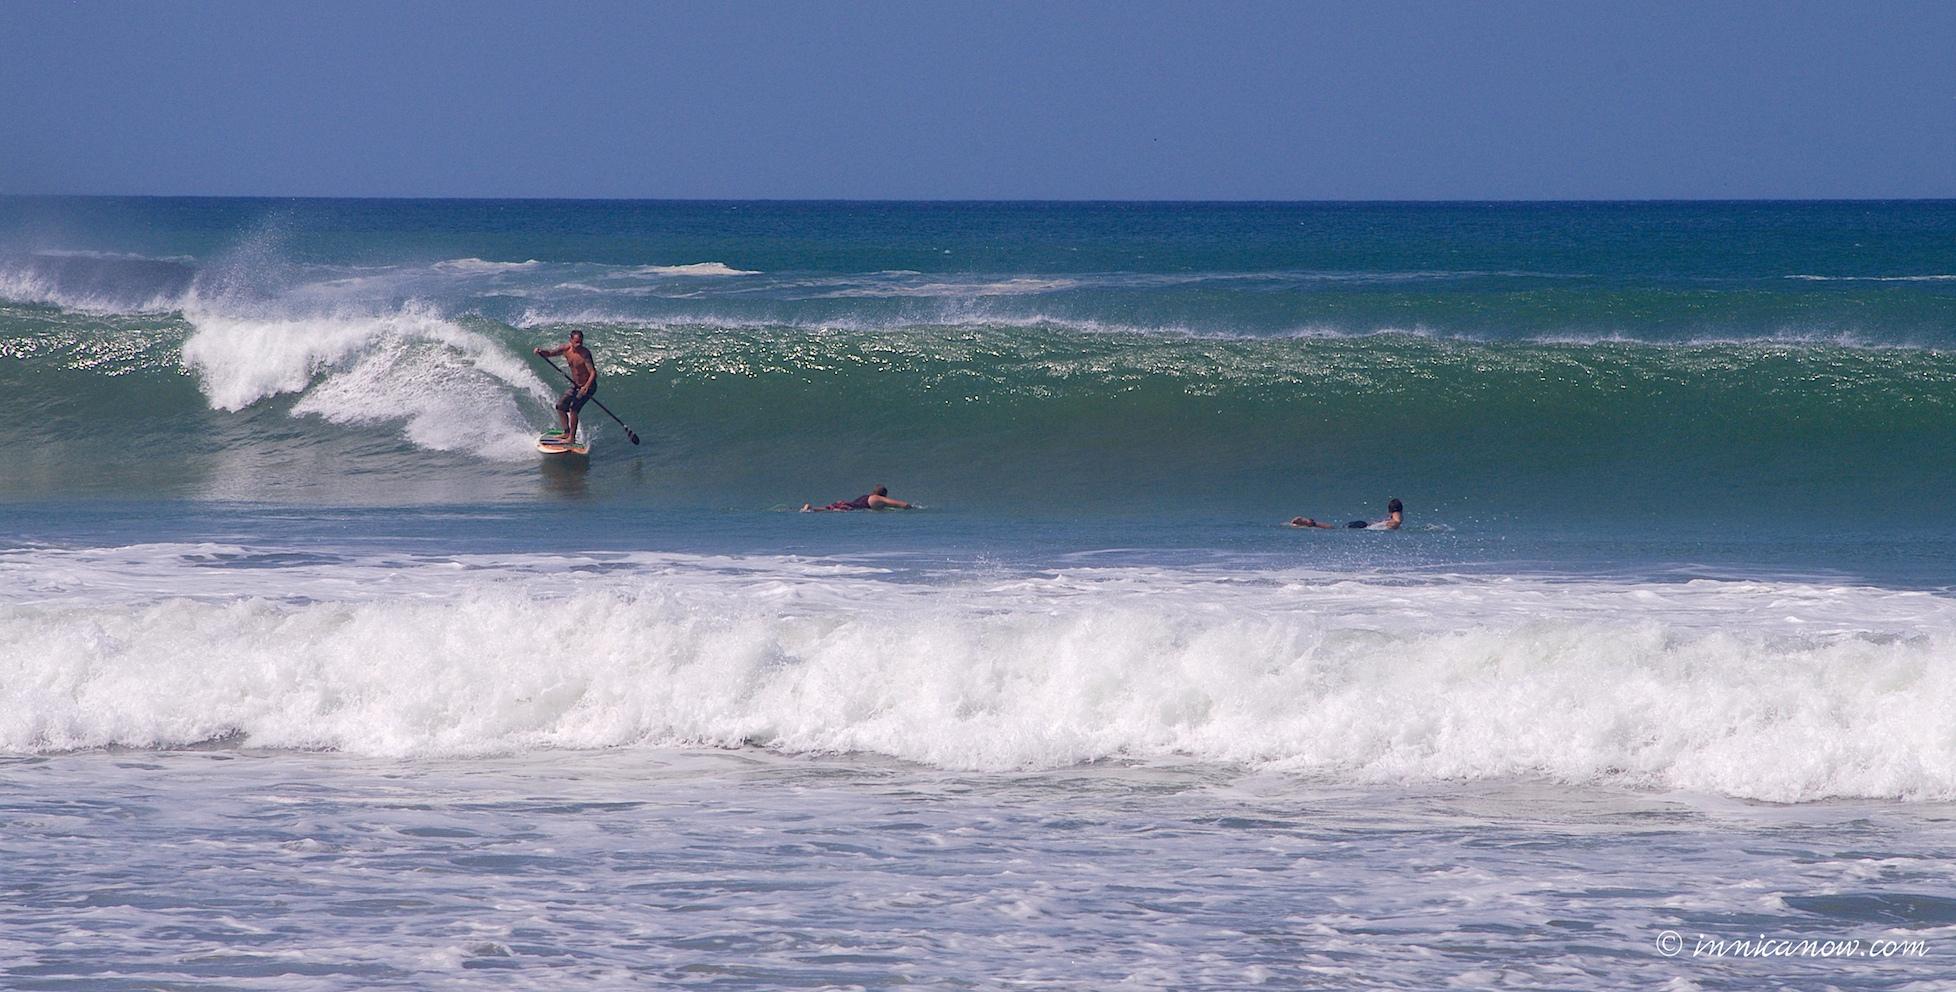 Guide to the beaches san juan del sur nicaragua in - Microcementos del sur ...